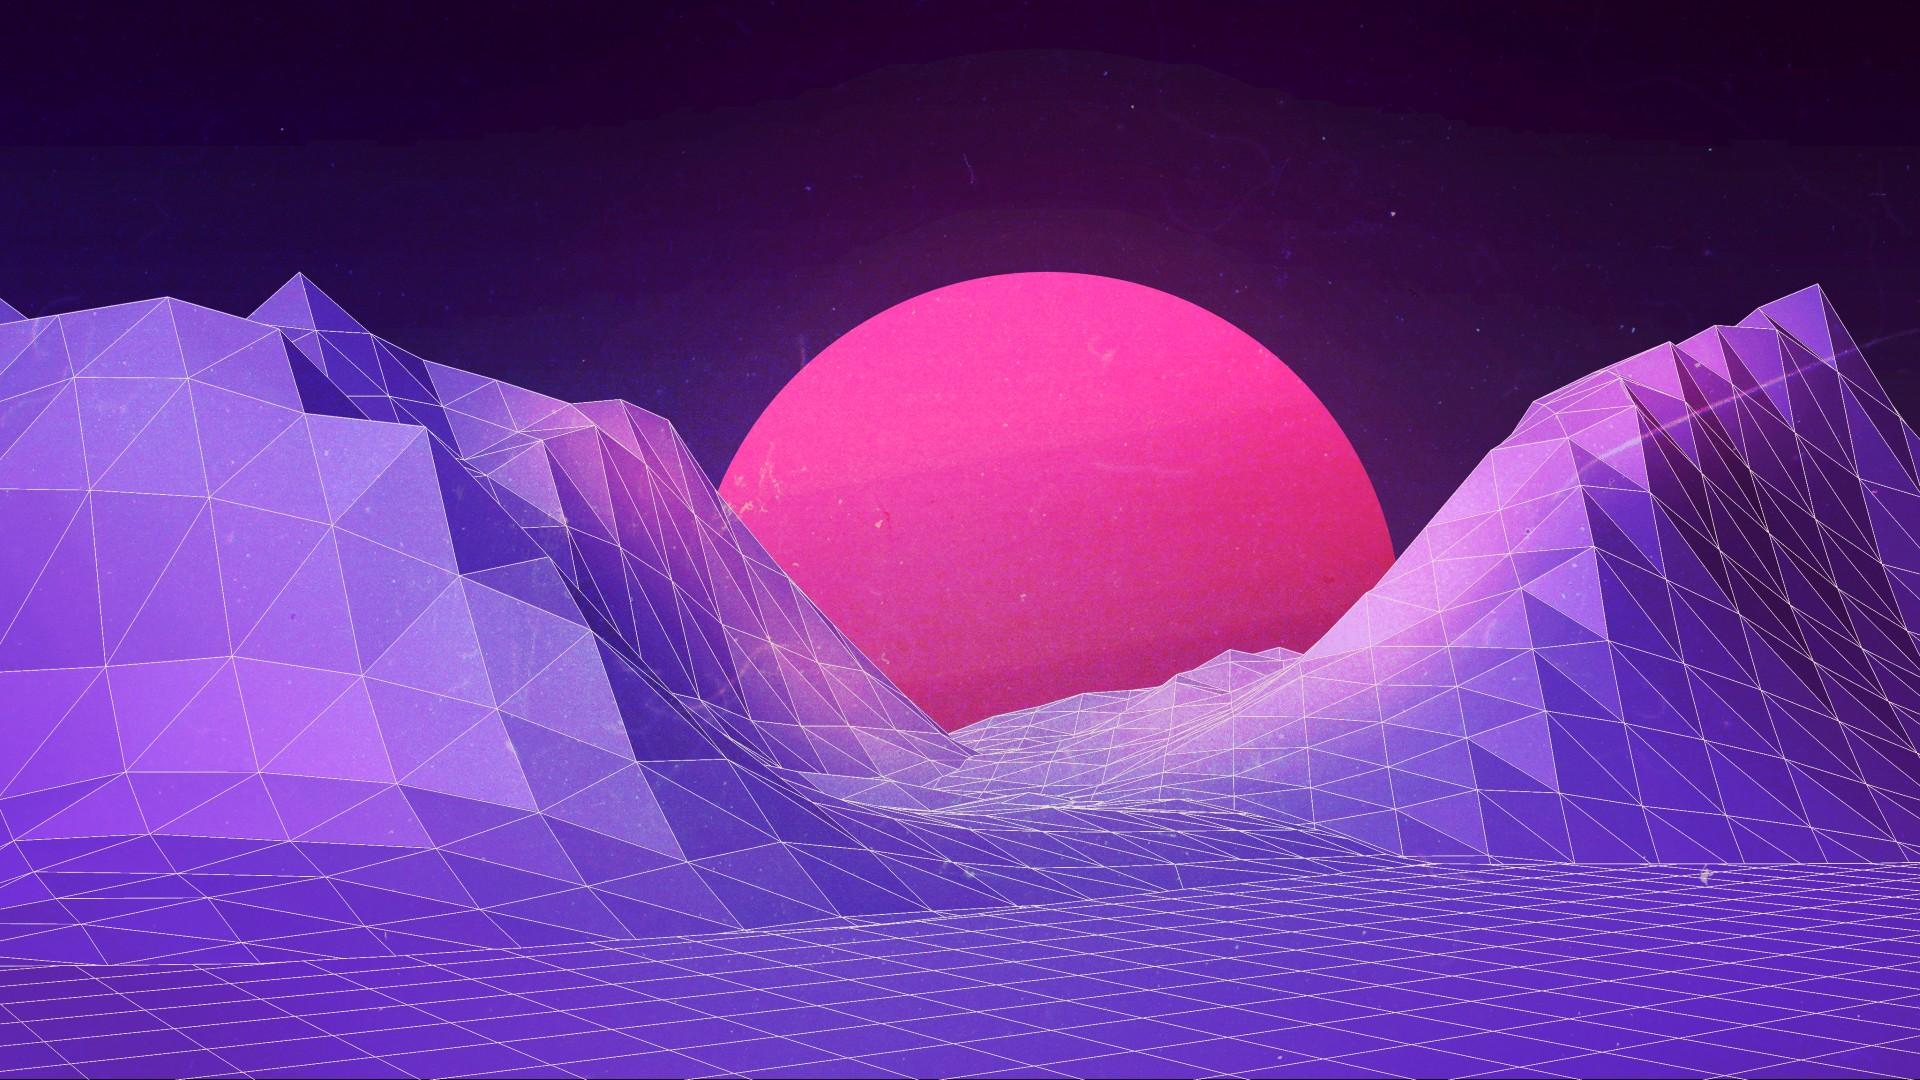 Iphone Wave Wallpaper Vaporwave Background 183 ① Download Free Stunning High